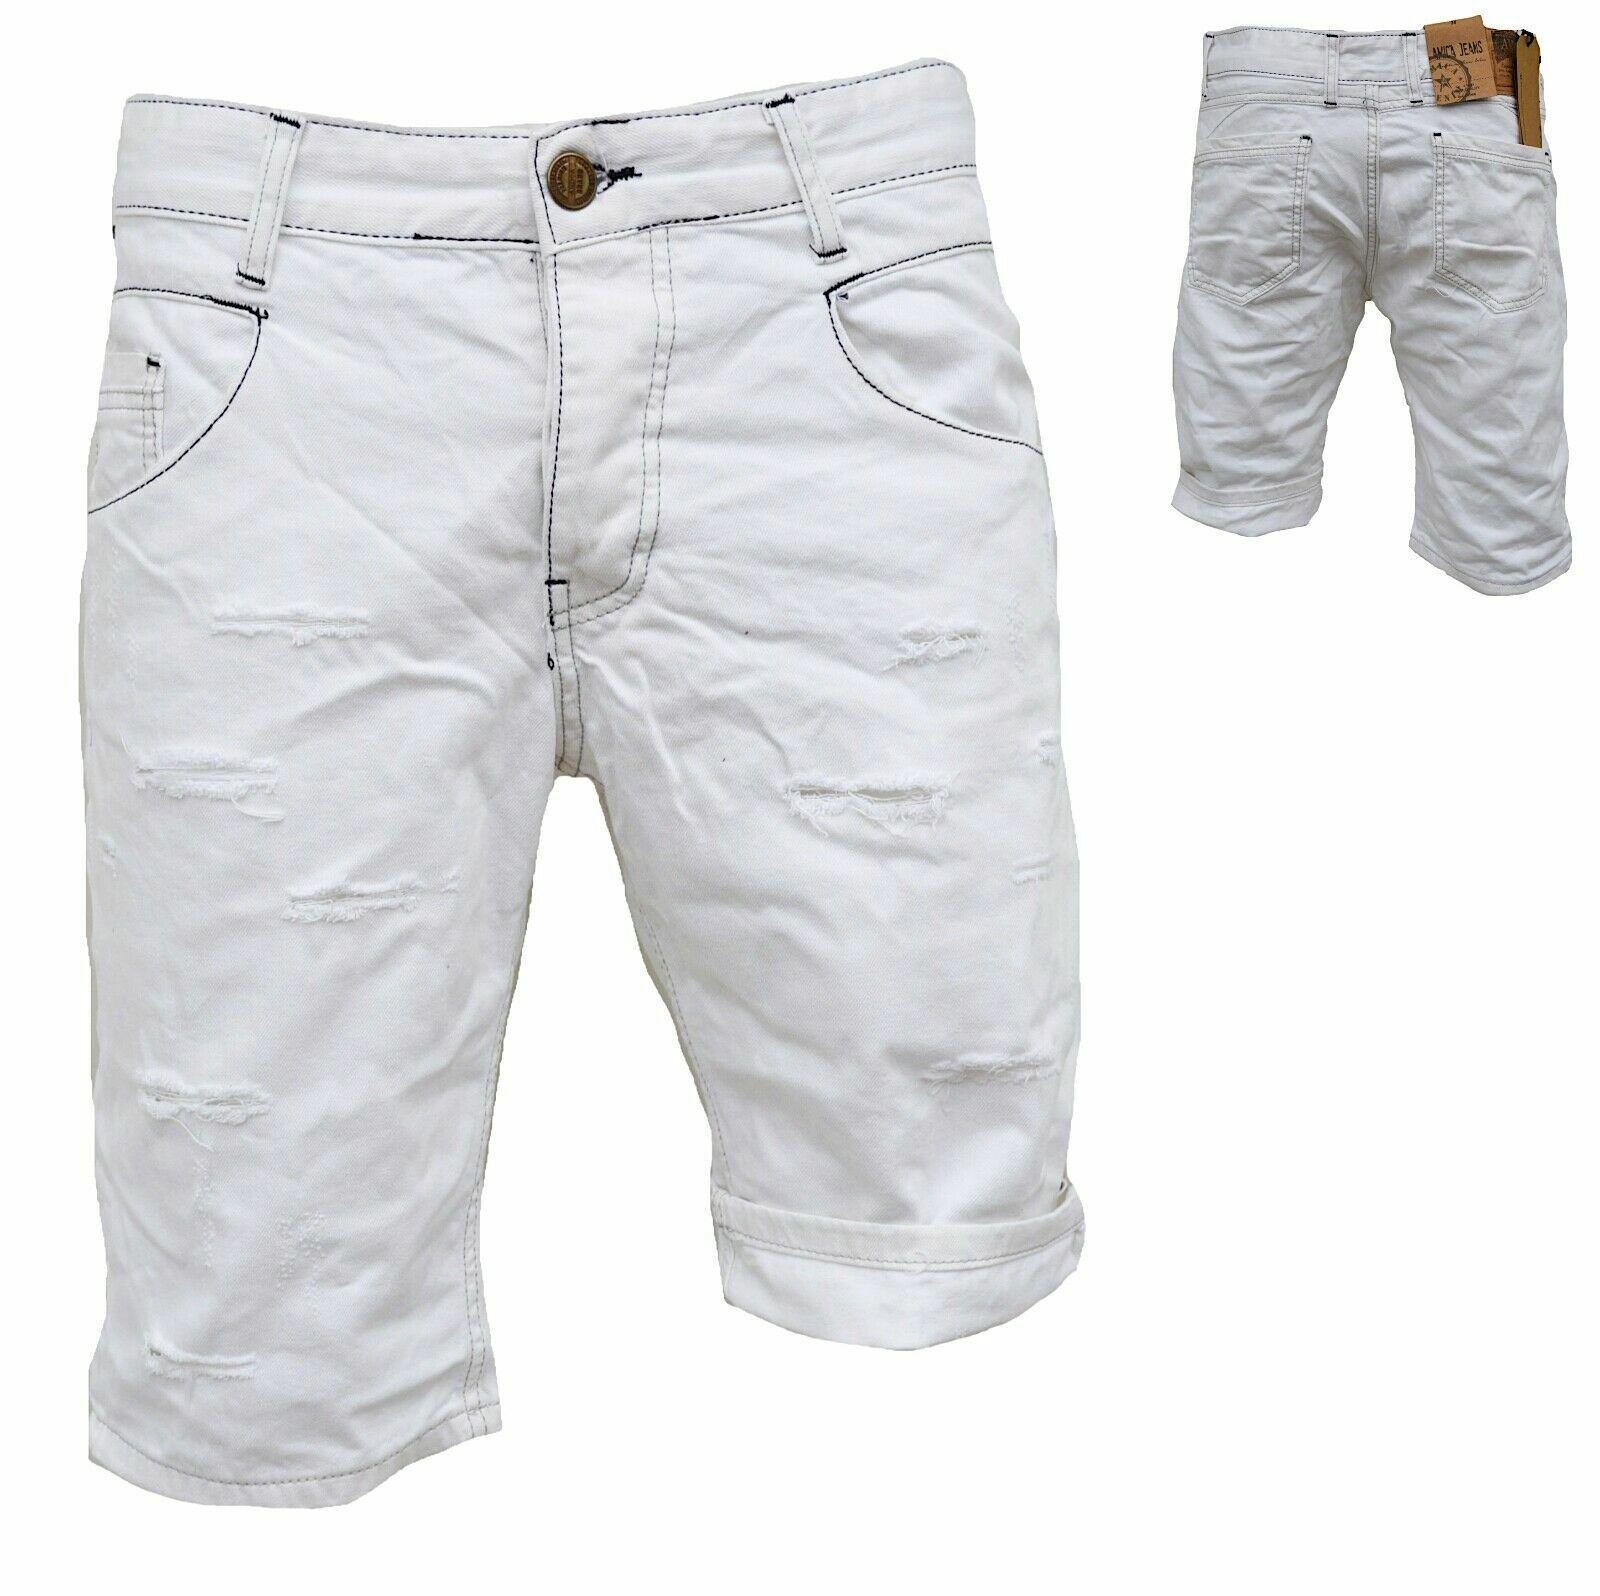 Herren Bermuda Jeans Shorts Stretch Denim Kurze Capri Hose Sommer 029 Weiss